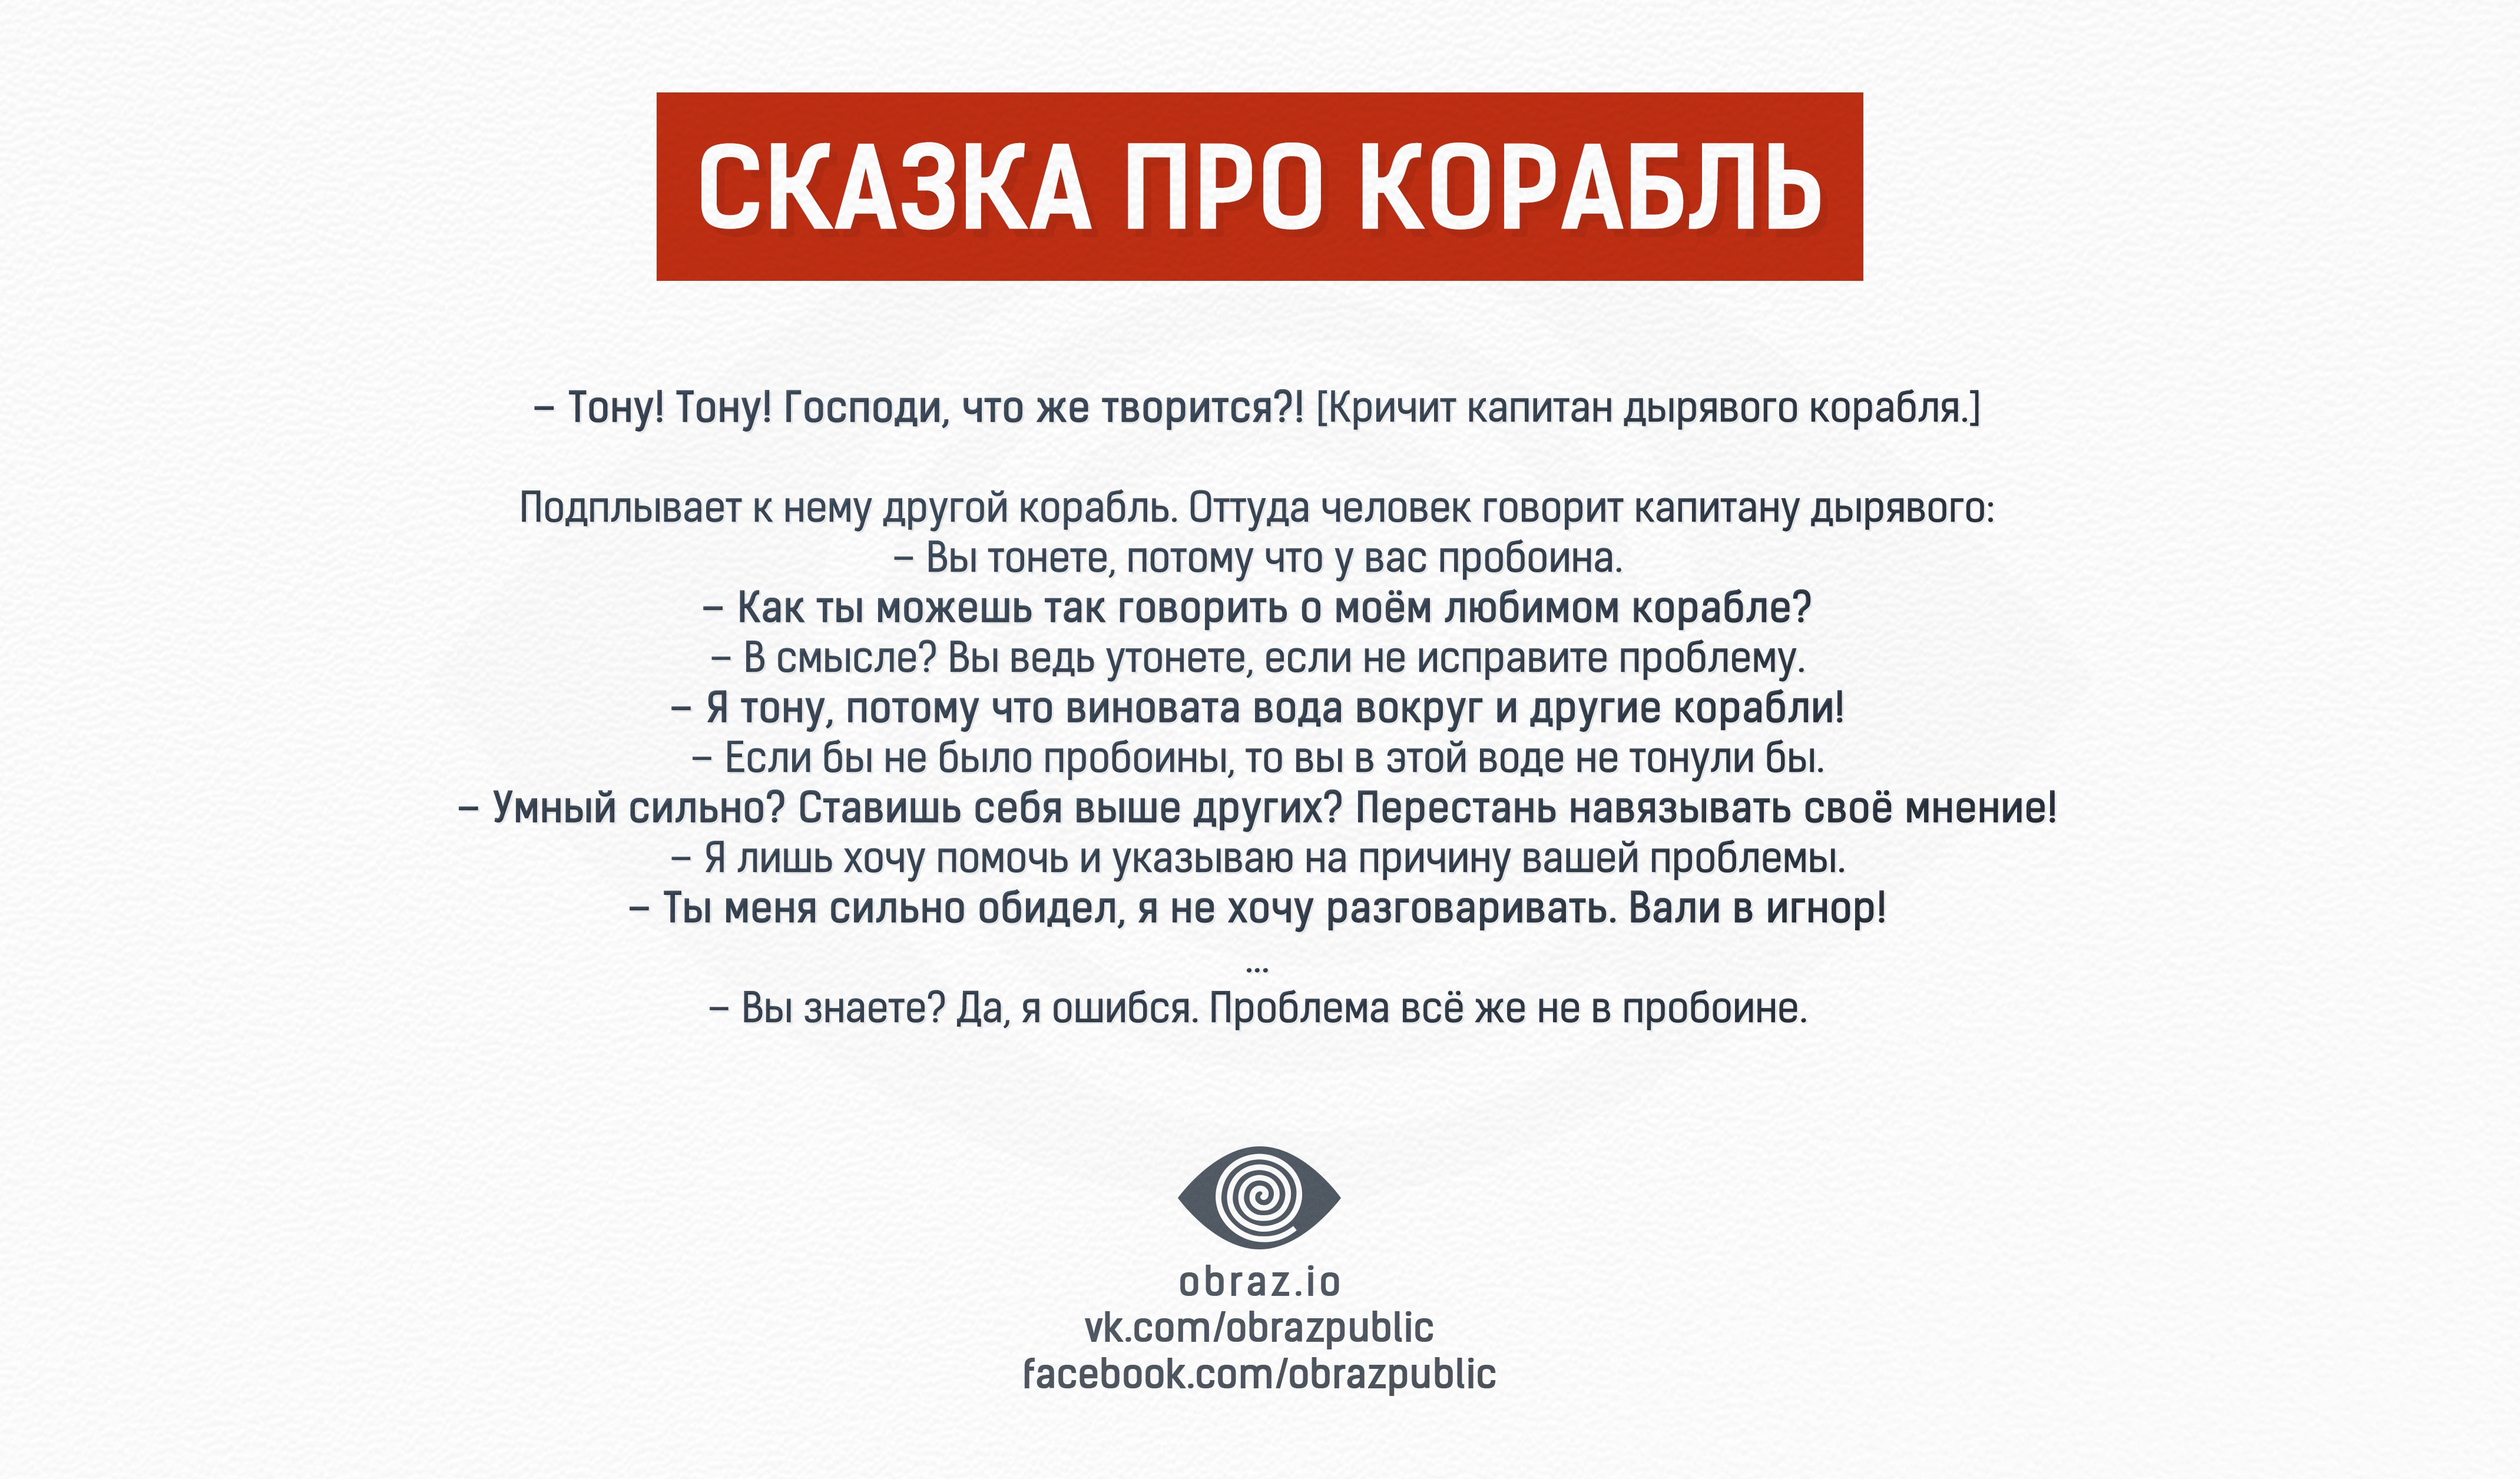 Email:learningkurakov@gmail com3292 1goy3zy.5uz0duc8fr